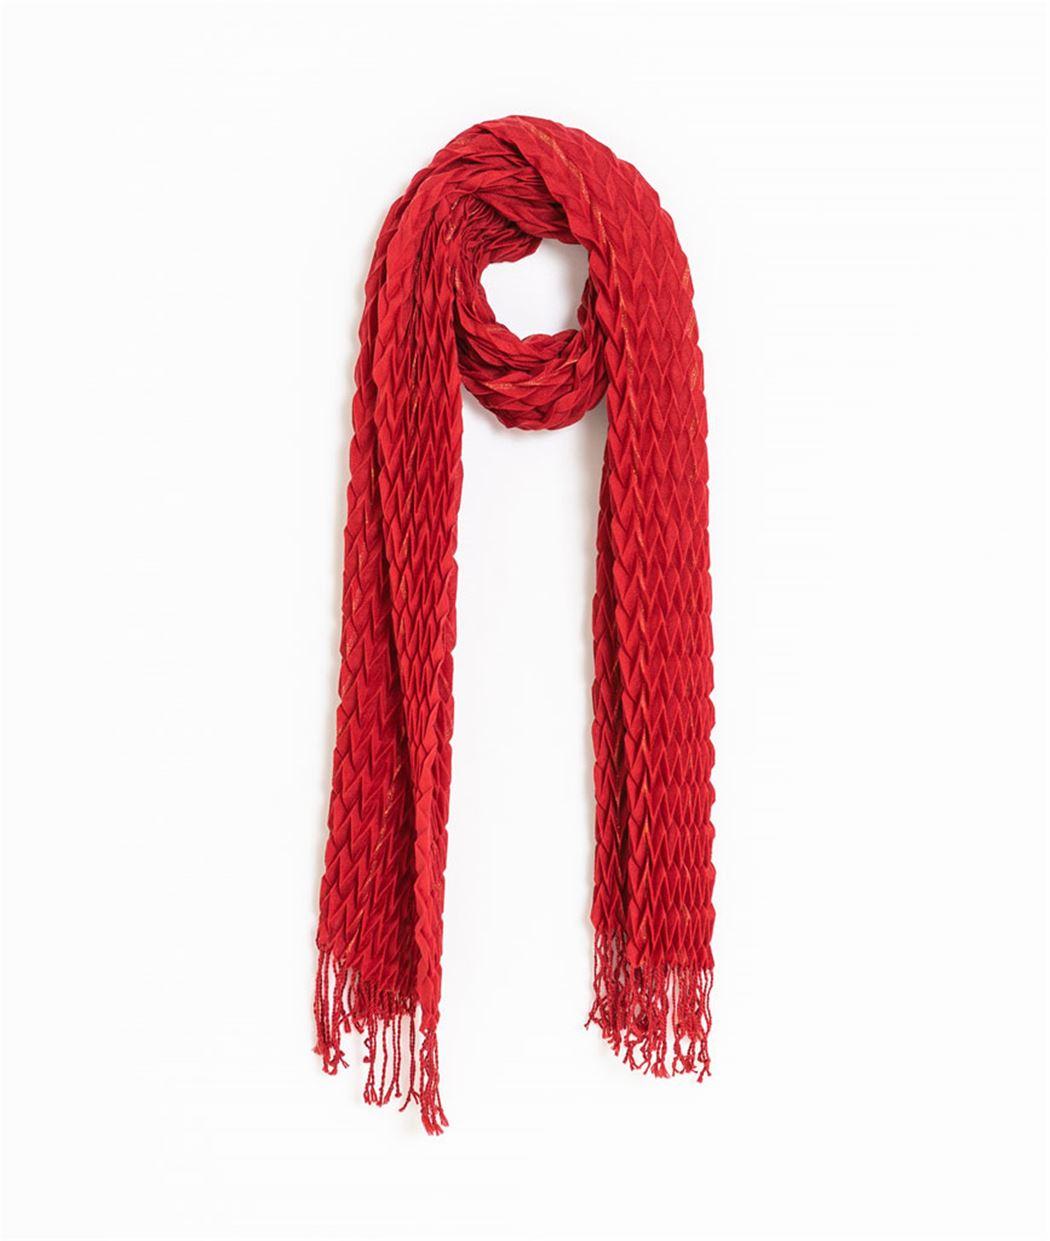 Foulard femme gaufré rouge ROUGE